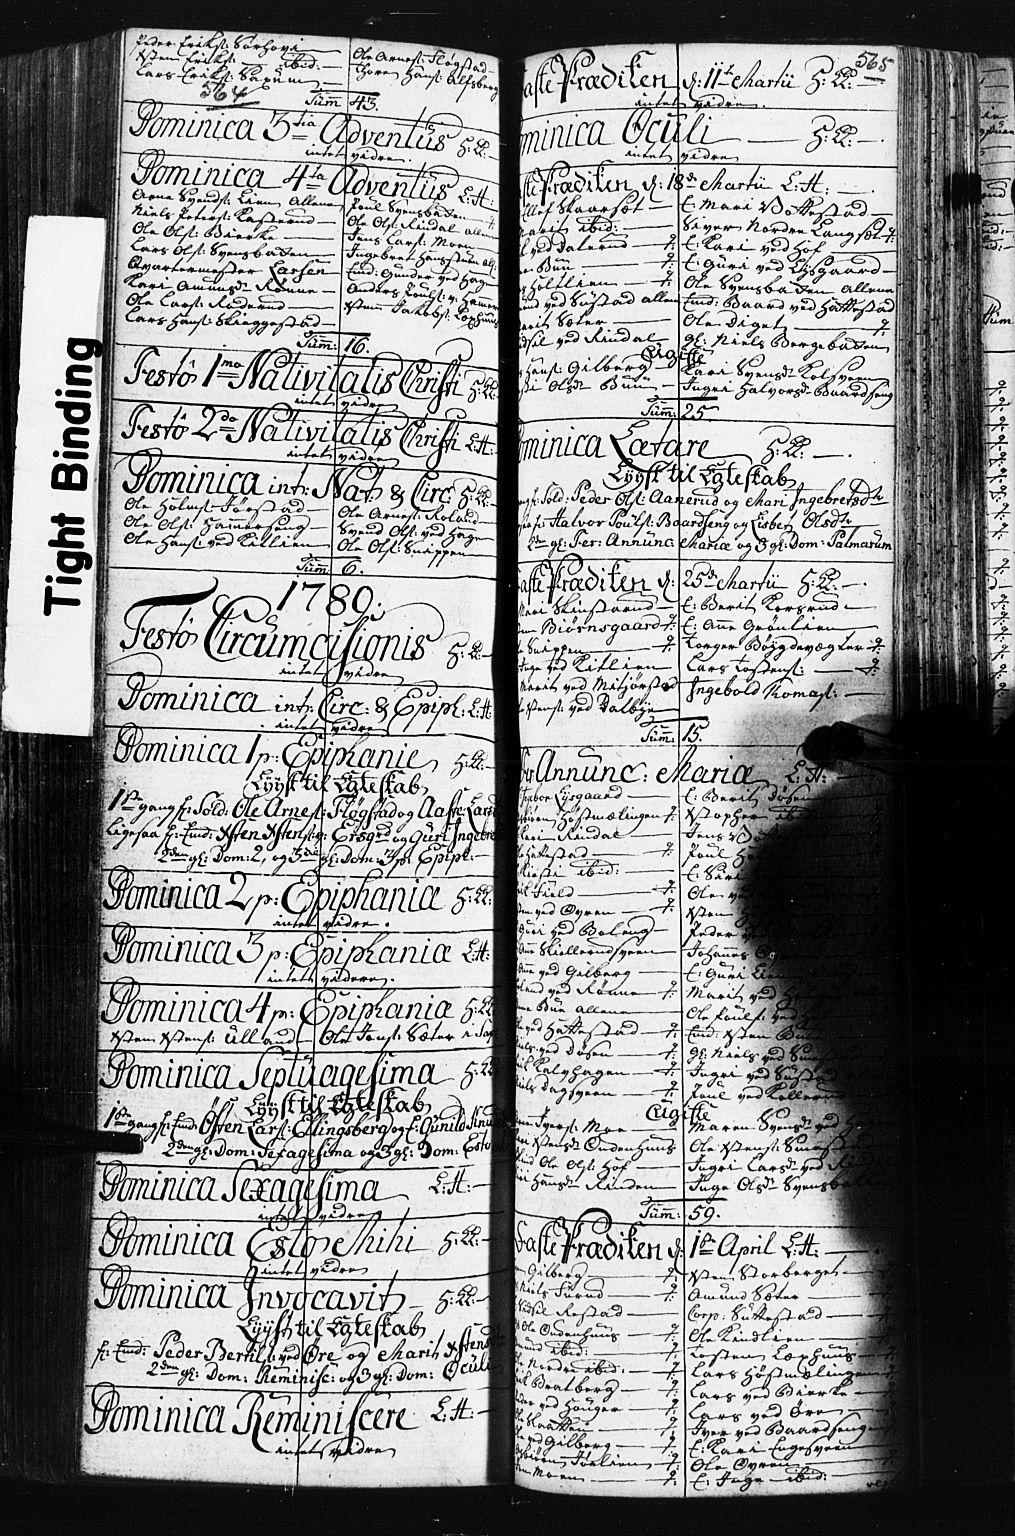 SAH, Fåberg prestekontor, Klokkerbok nr. 3, 1768-1796, s. 564-565